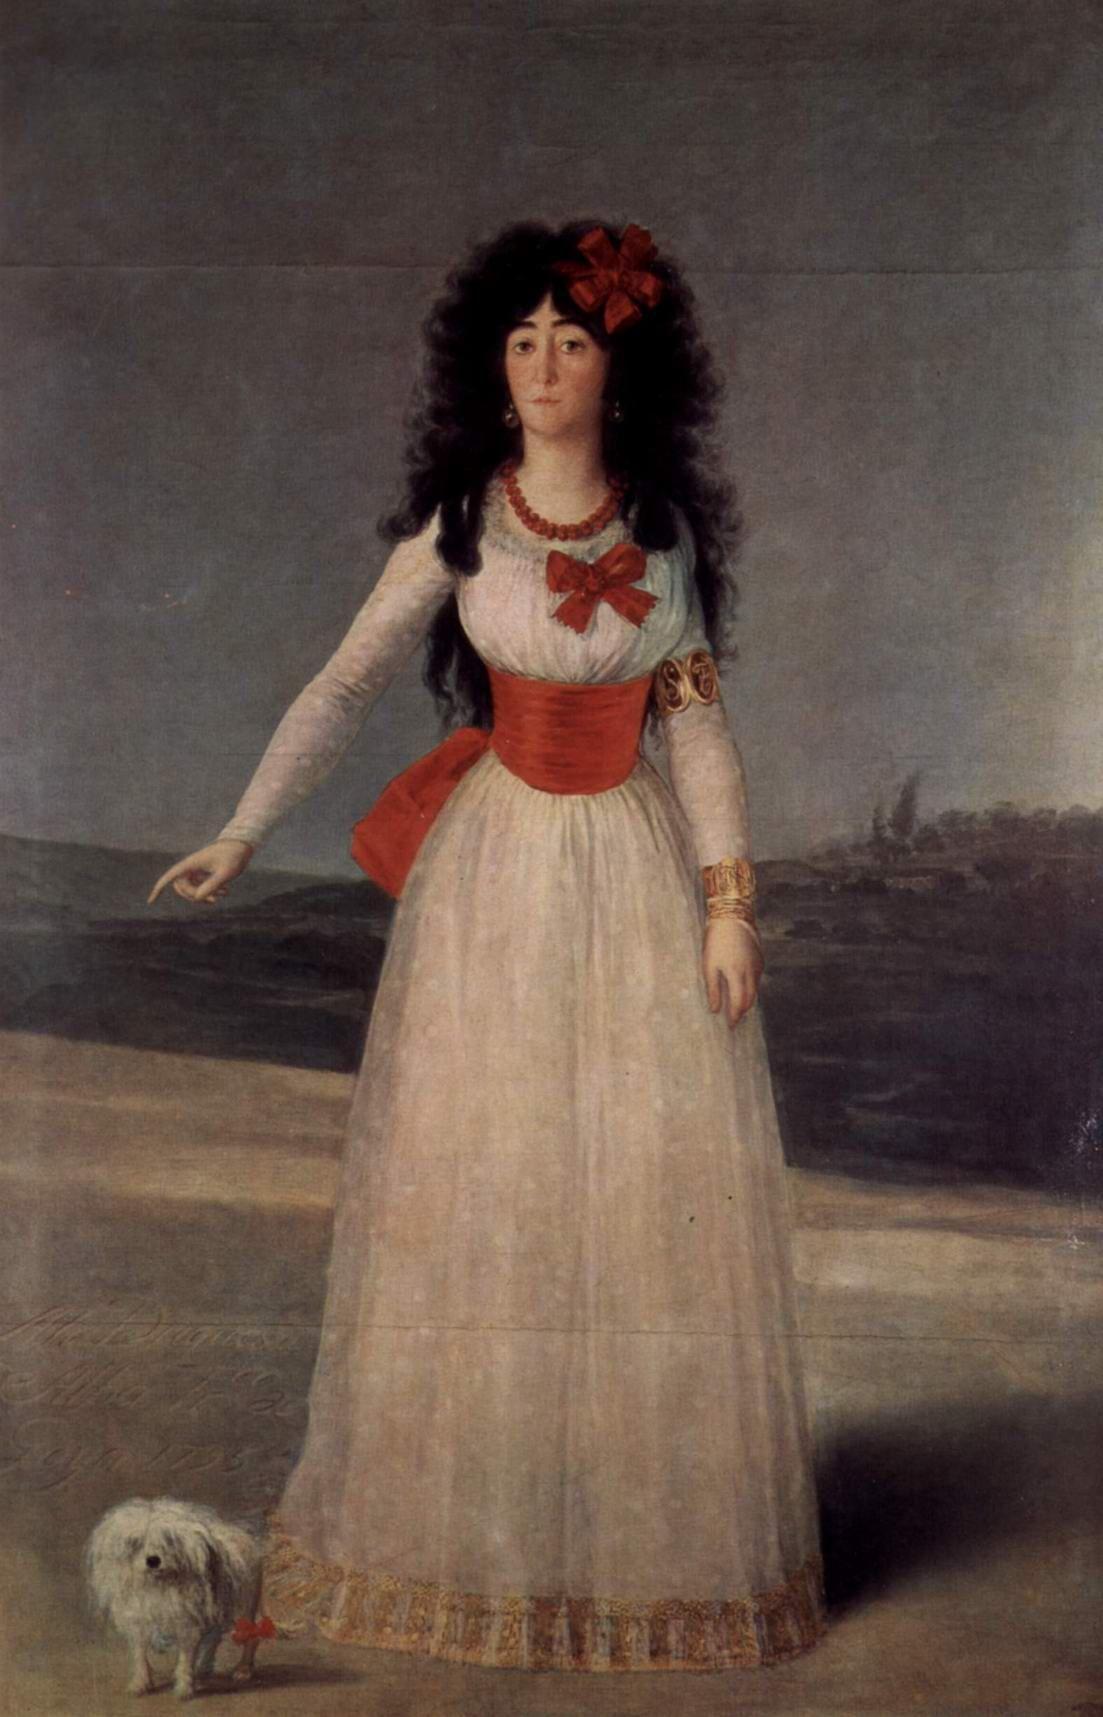 Гойя. Портрет Марии Терезы Кайетана де Сильва, герцогини Альба.